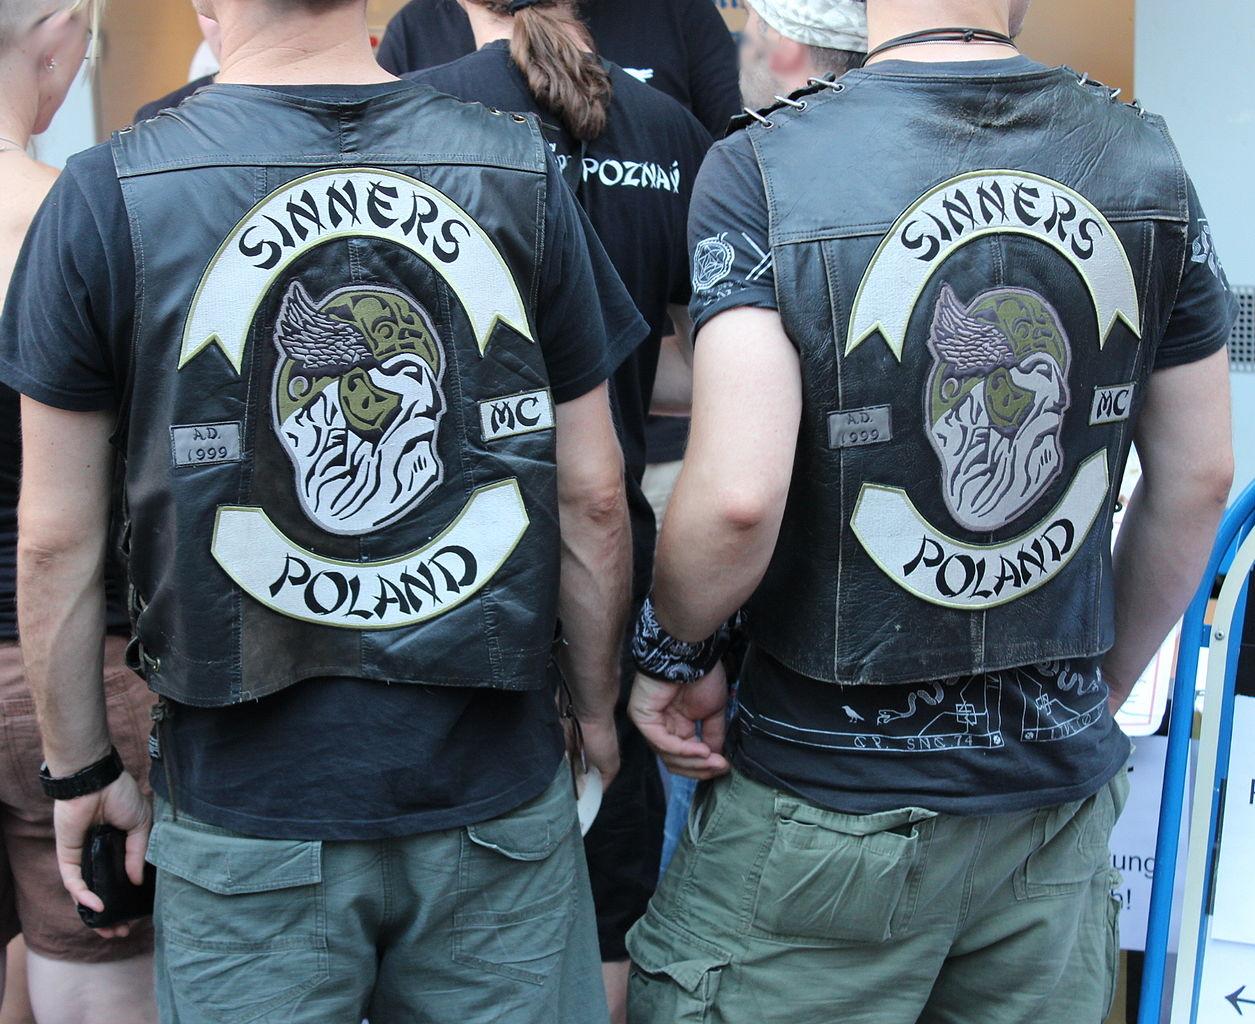 Members of Sinners motorcycle club, Poland